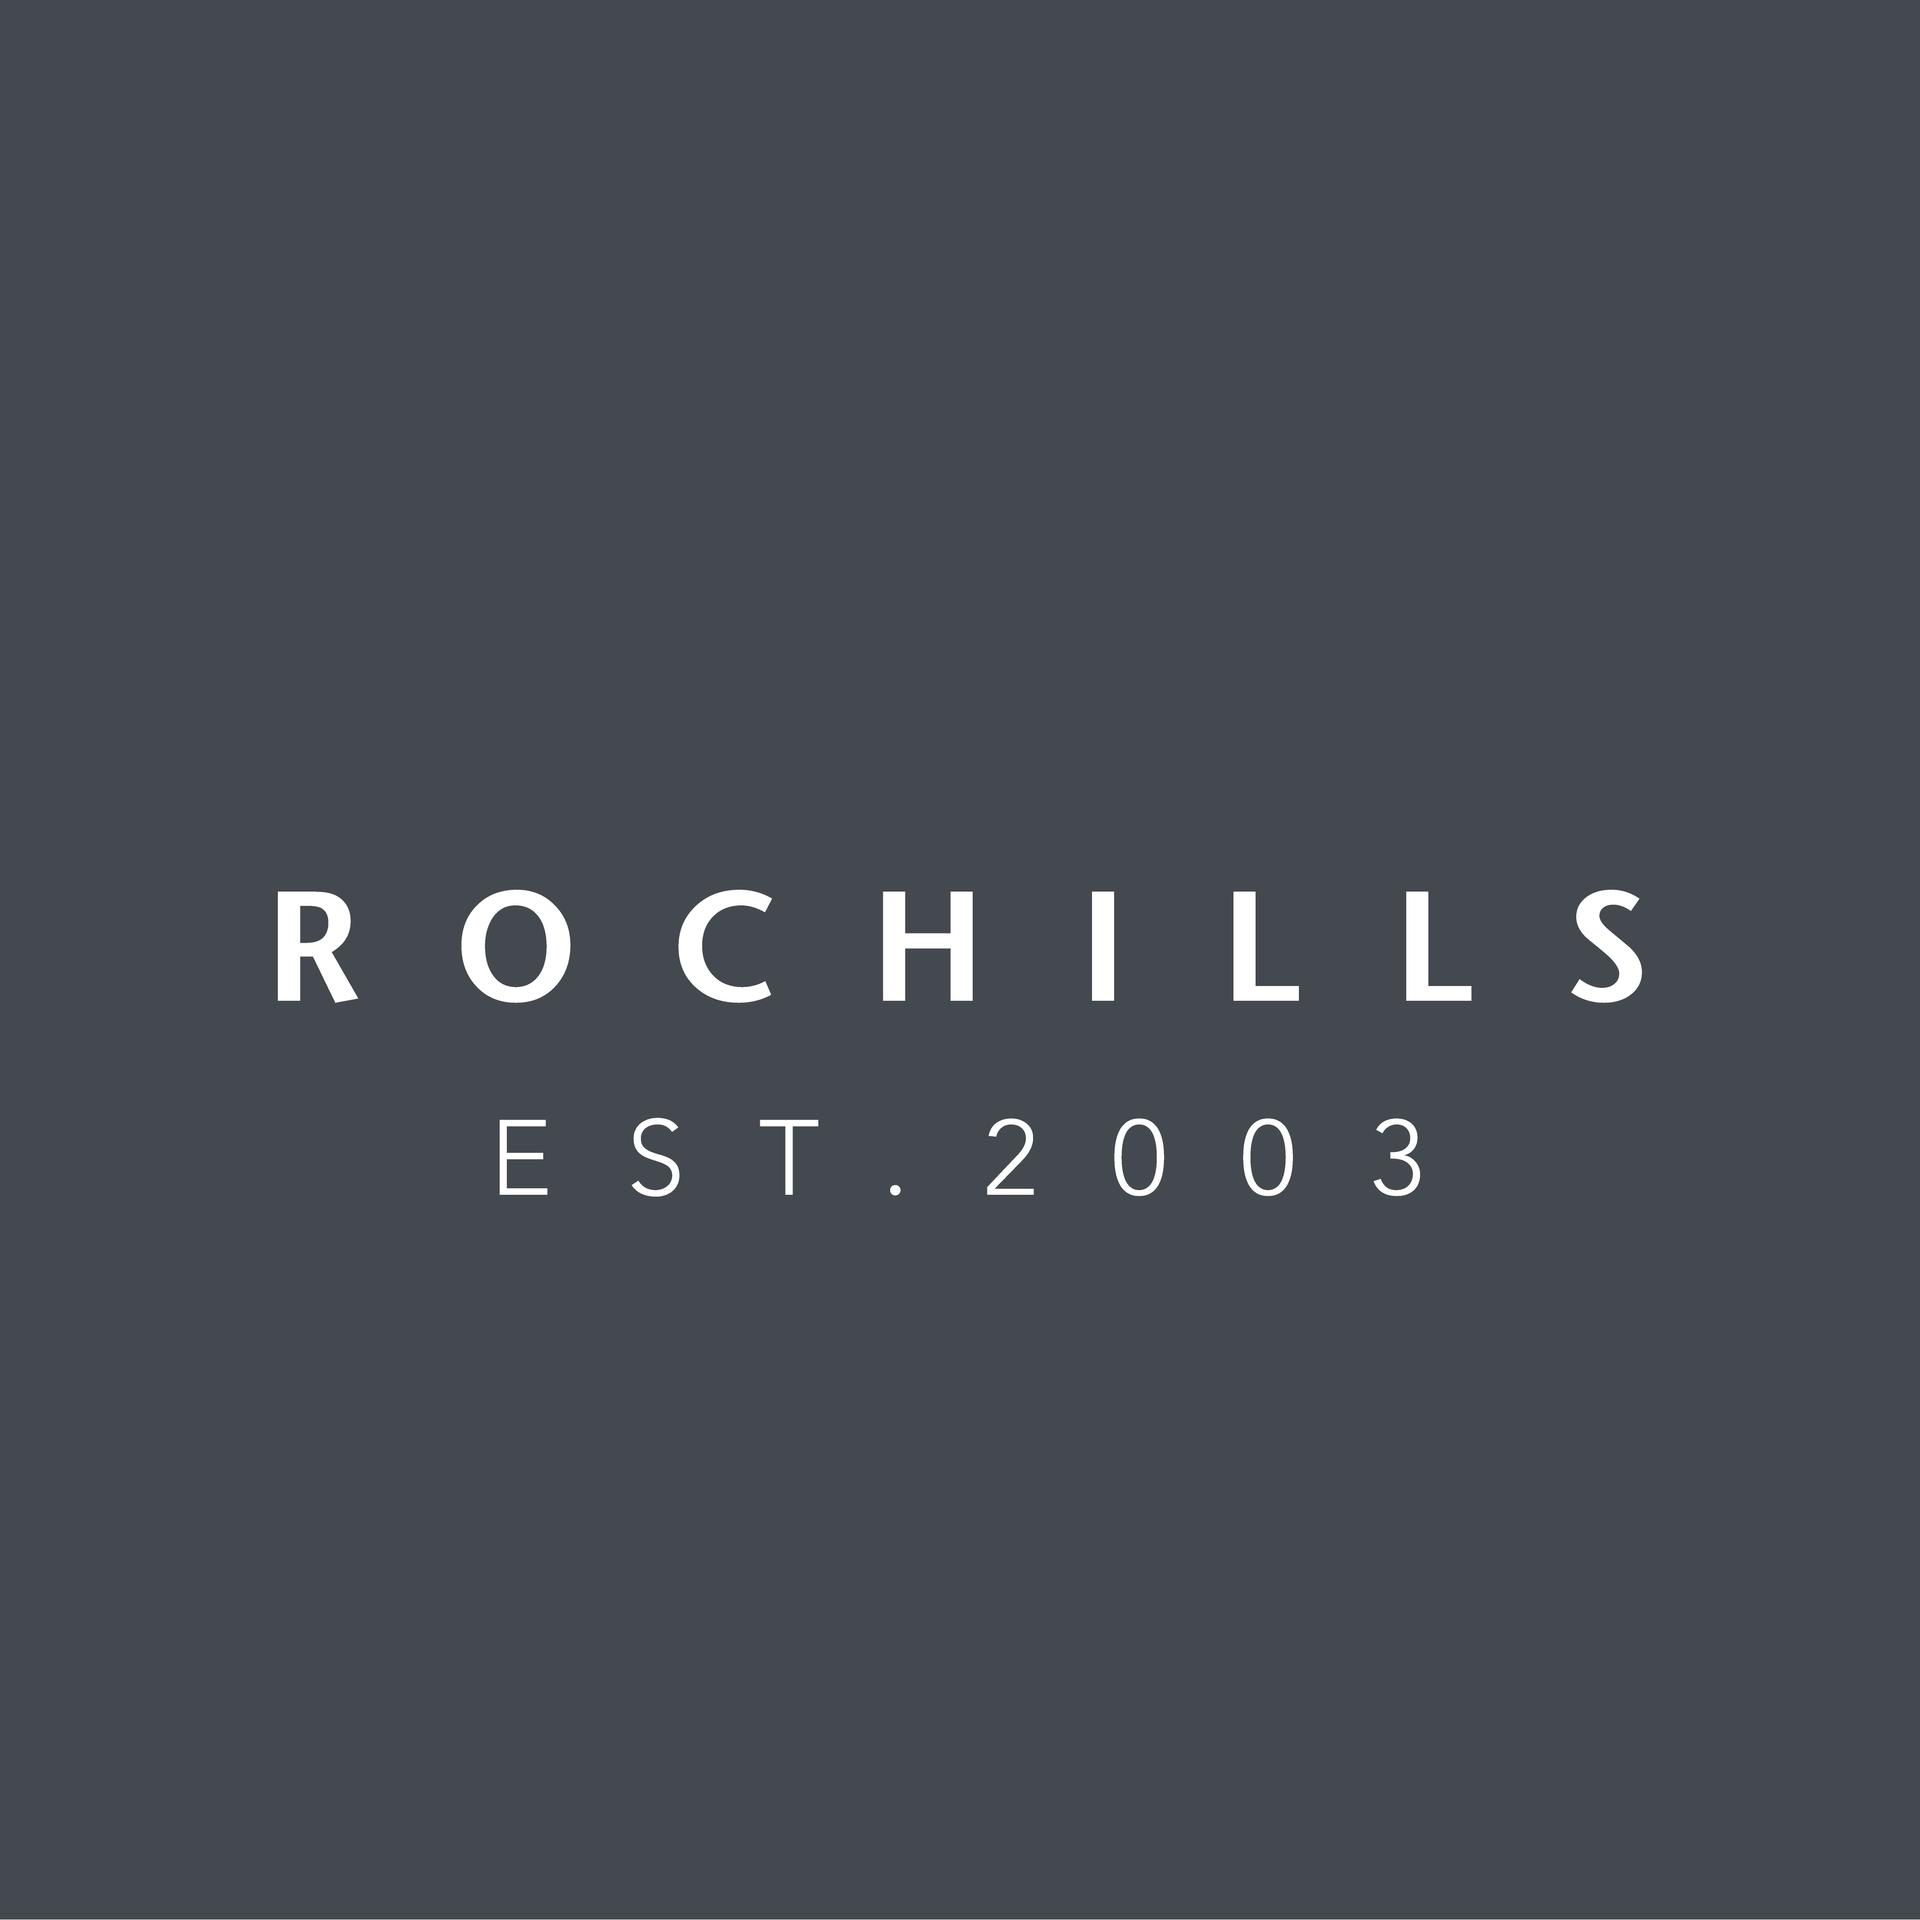 Rochills Estate Agency Branding | Brand Identity Design by Fresh Leaf Creative